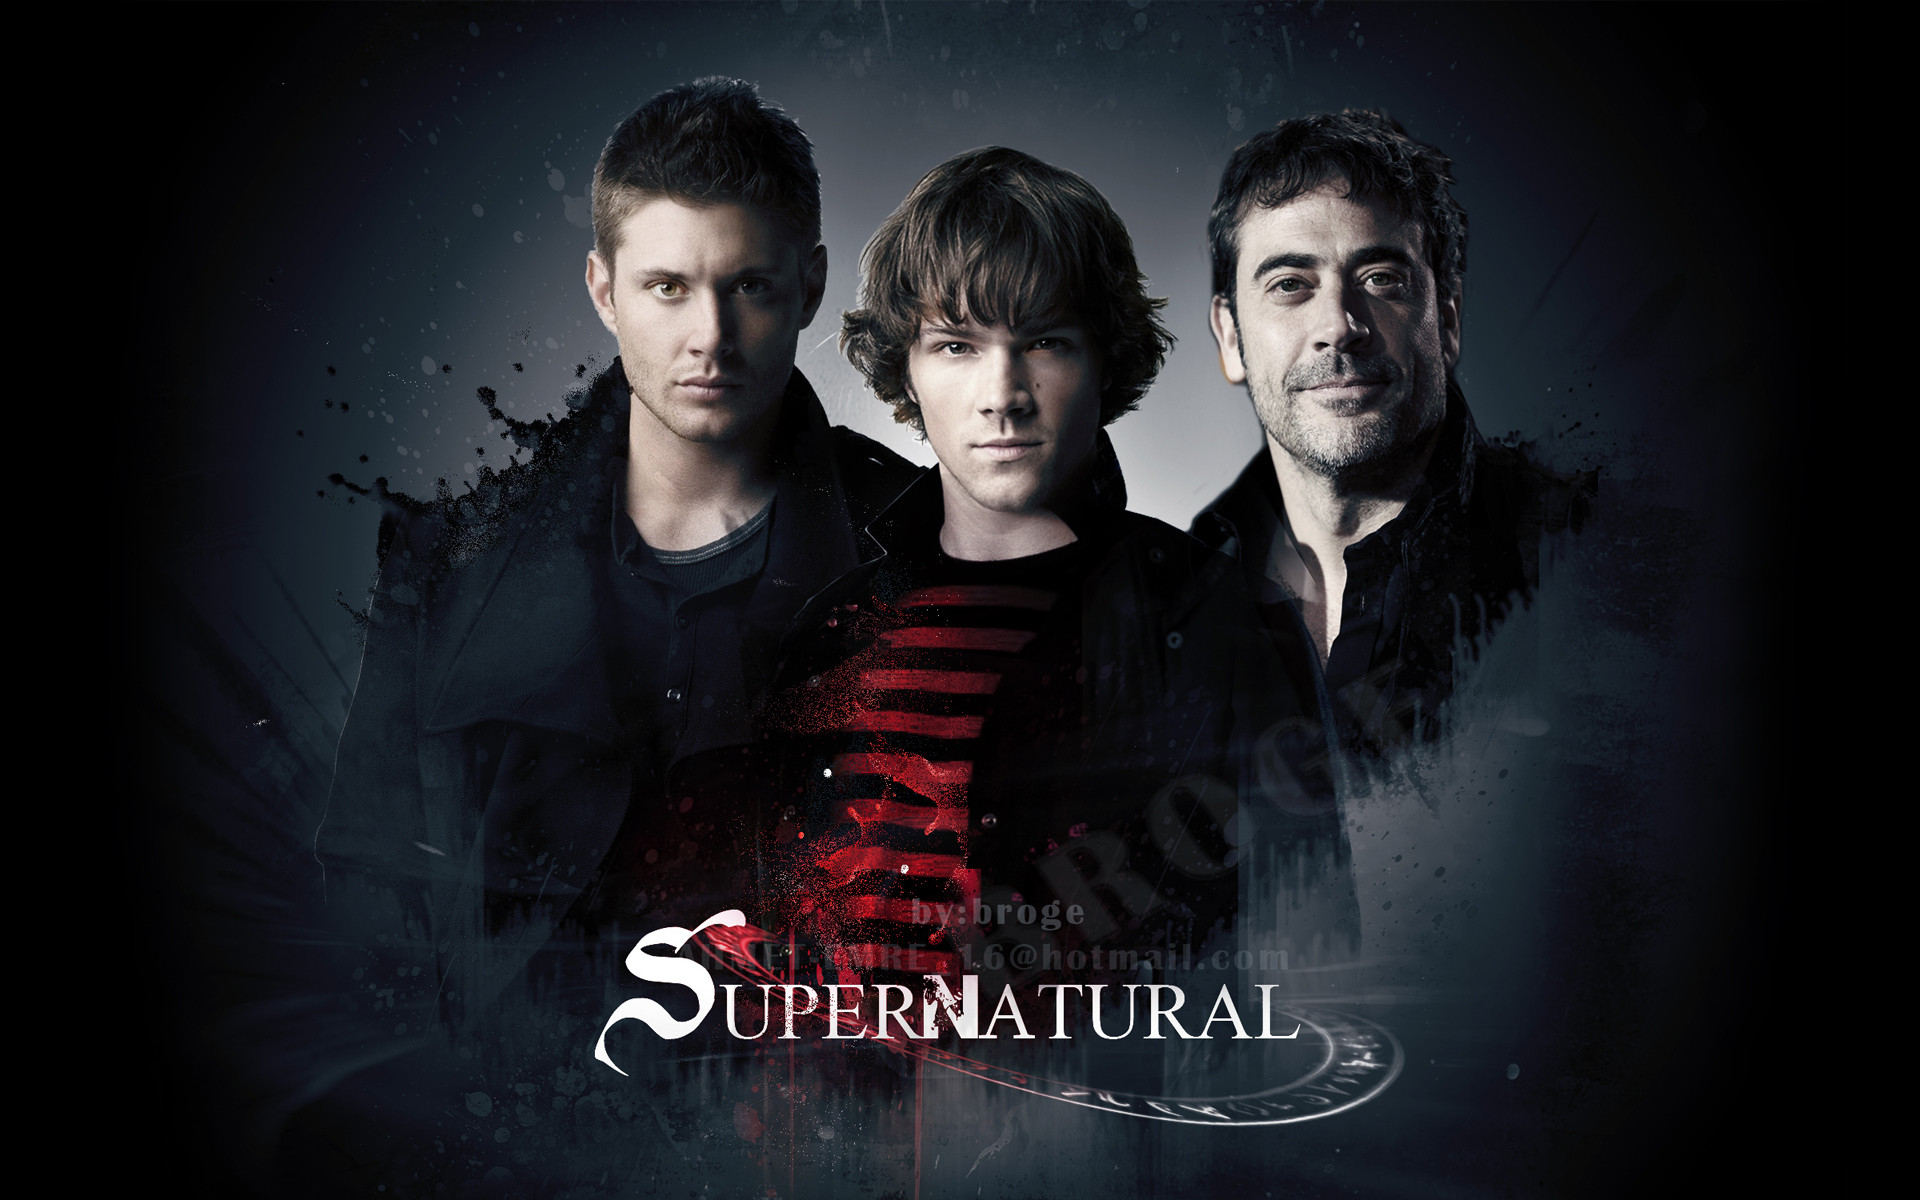 HD Wallpaper and background photos of supernatural dean sam John for fans  of Supernatural images.